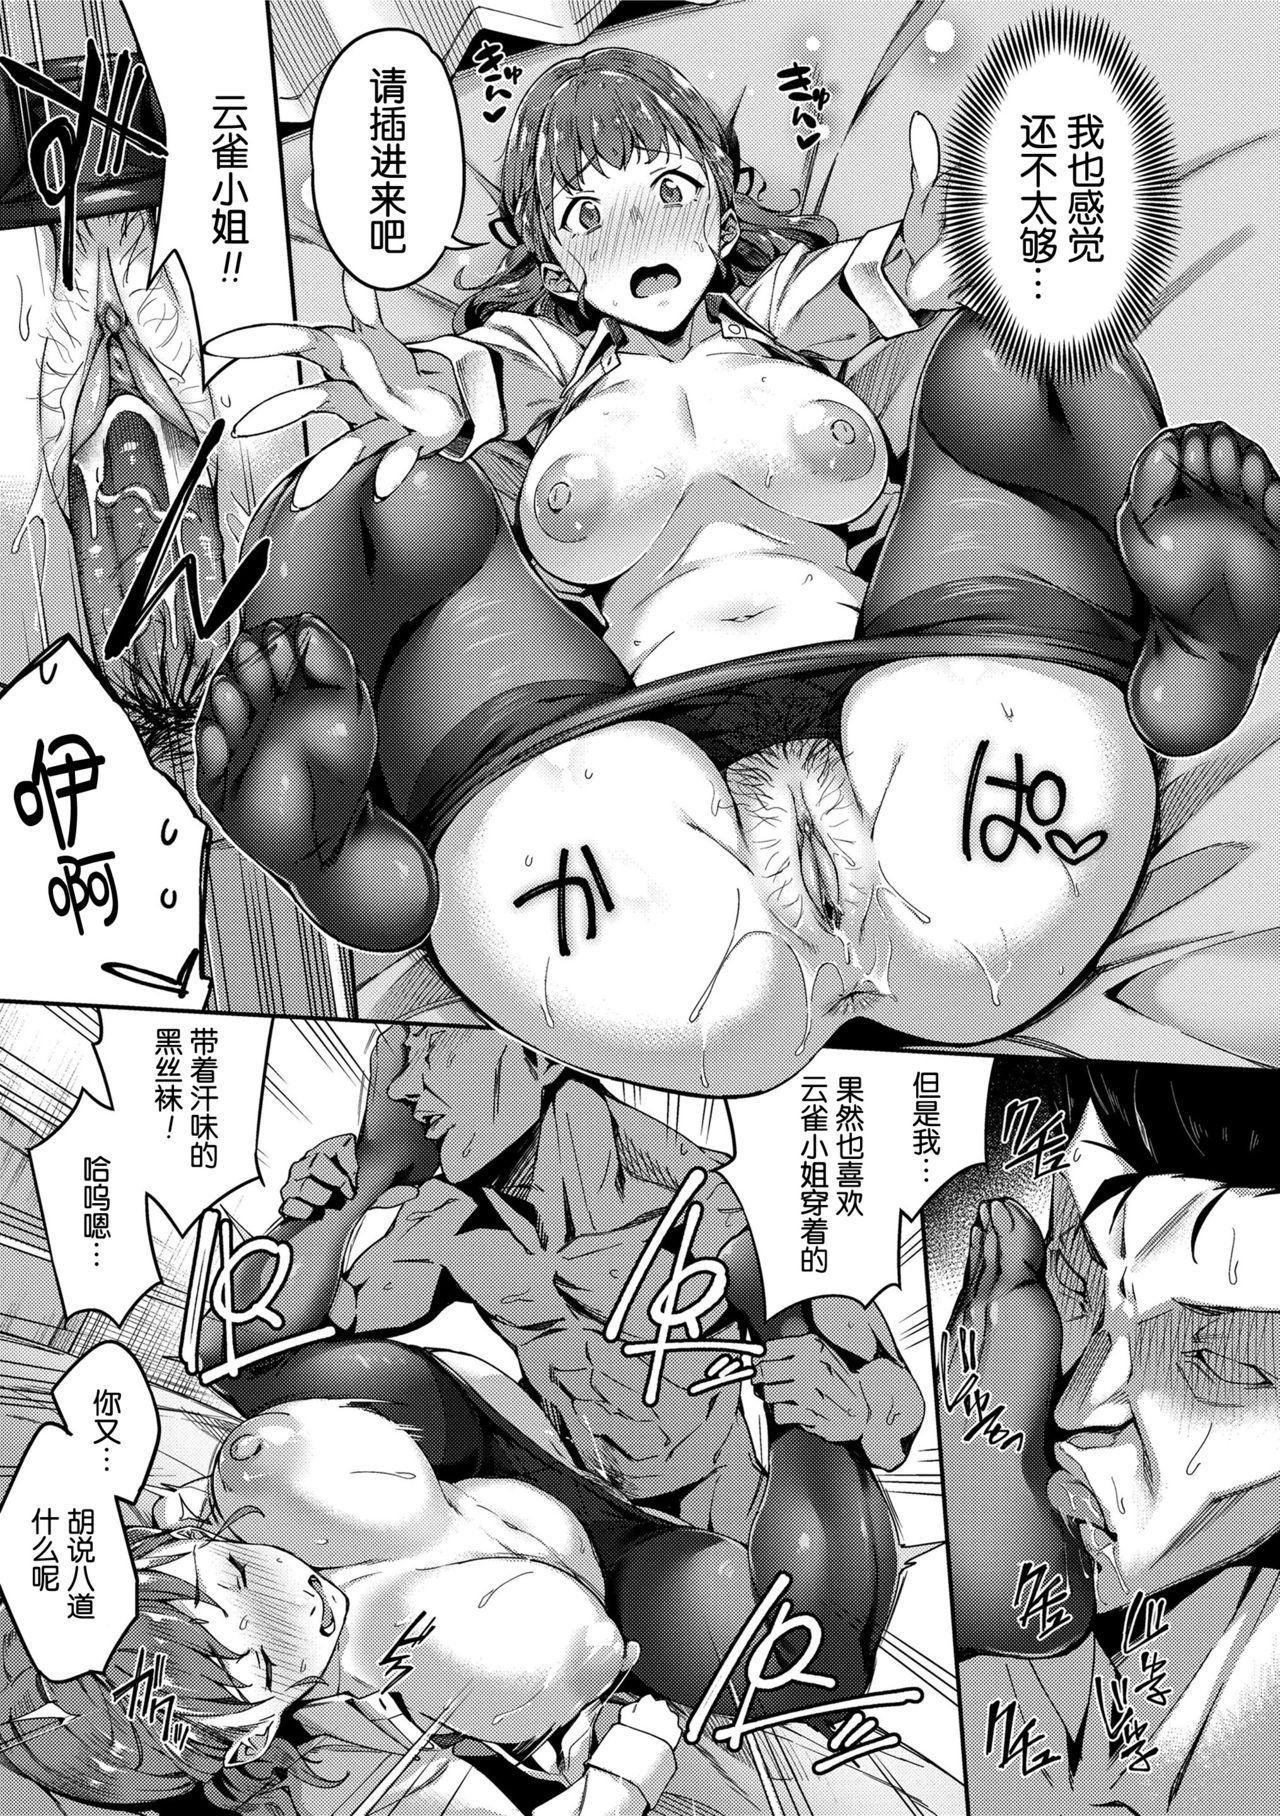 [sugarBt] Ai ga Nakutemo Ecchi wa Dekiru! - Even if There is No Love You Can H! Ch. 1-2 [Chinese] [Decensored] 34